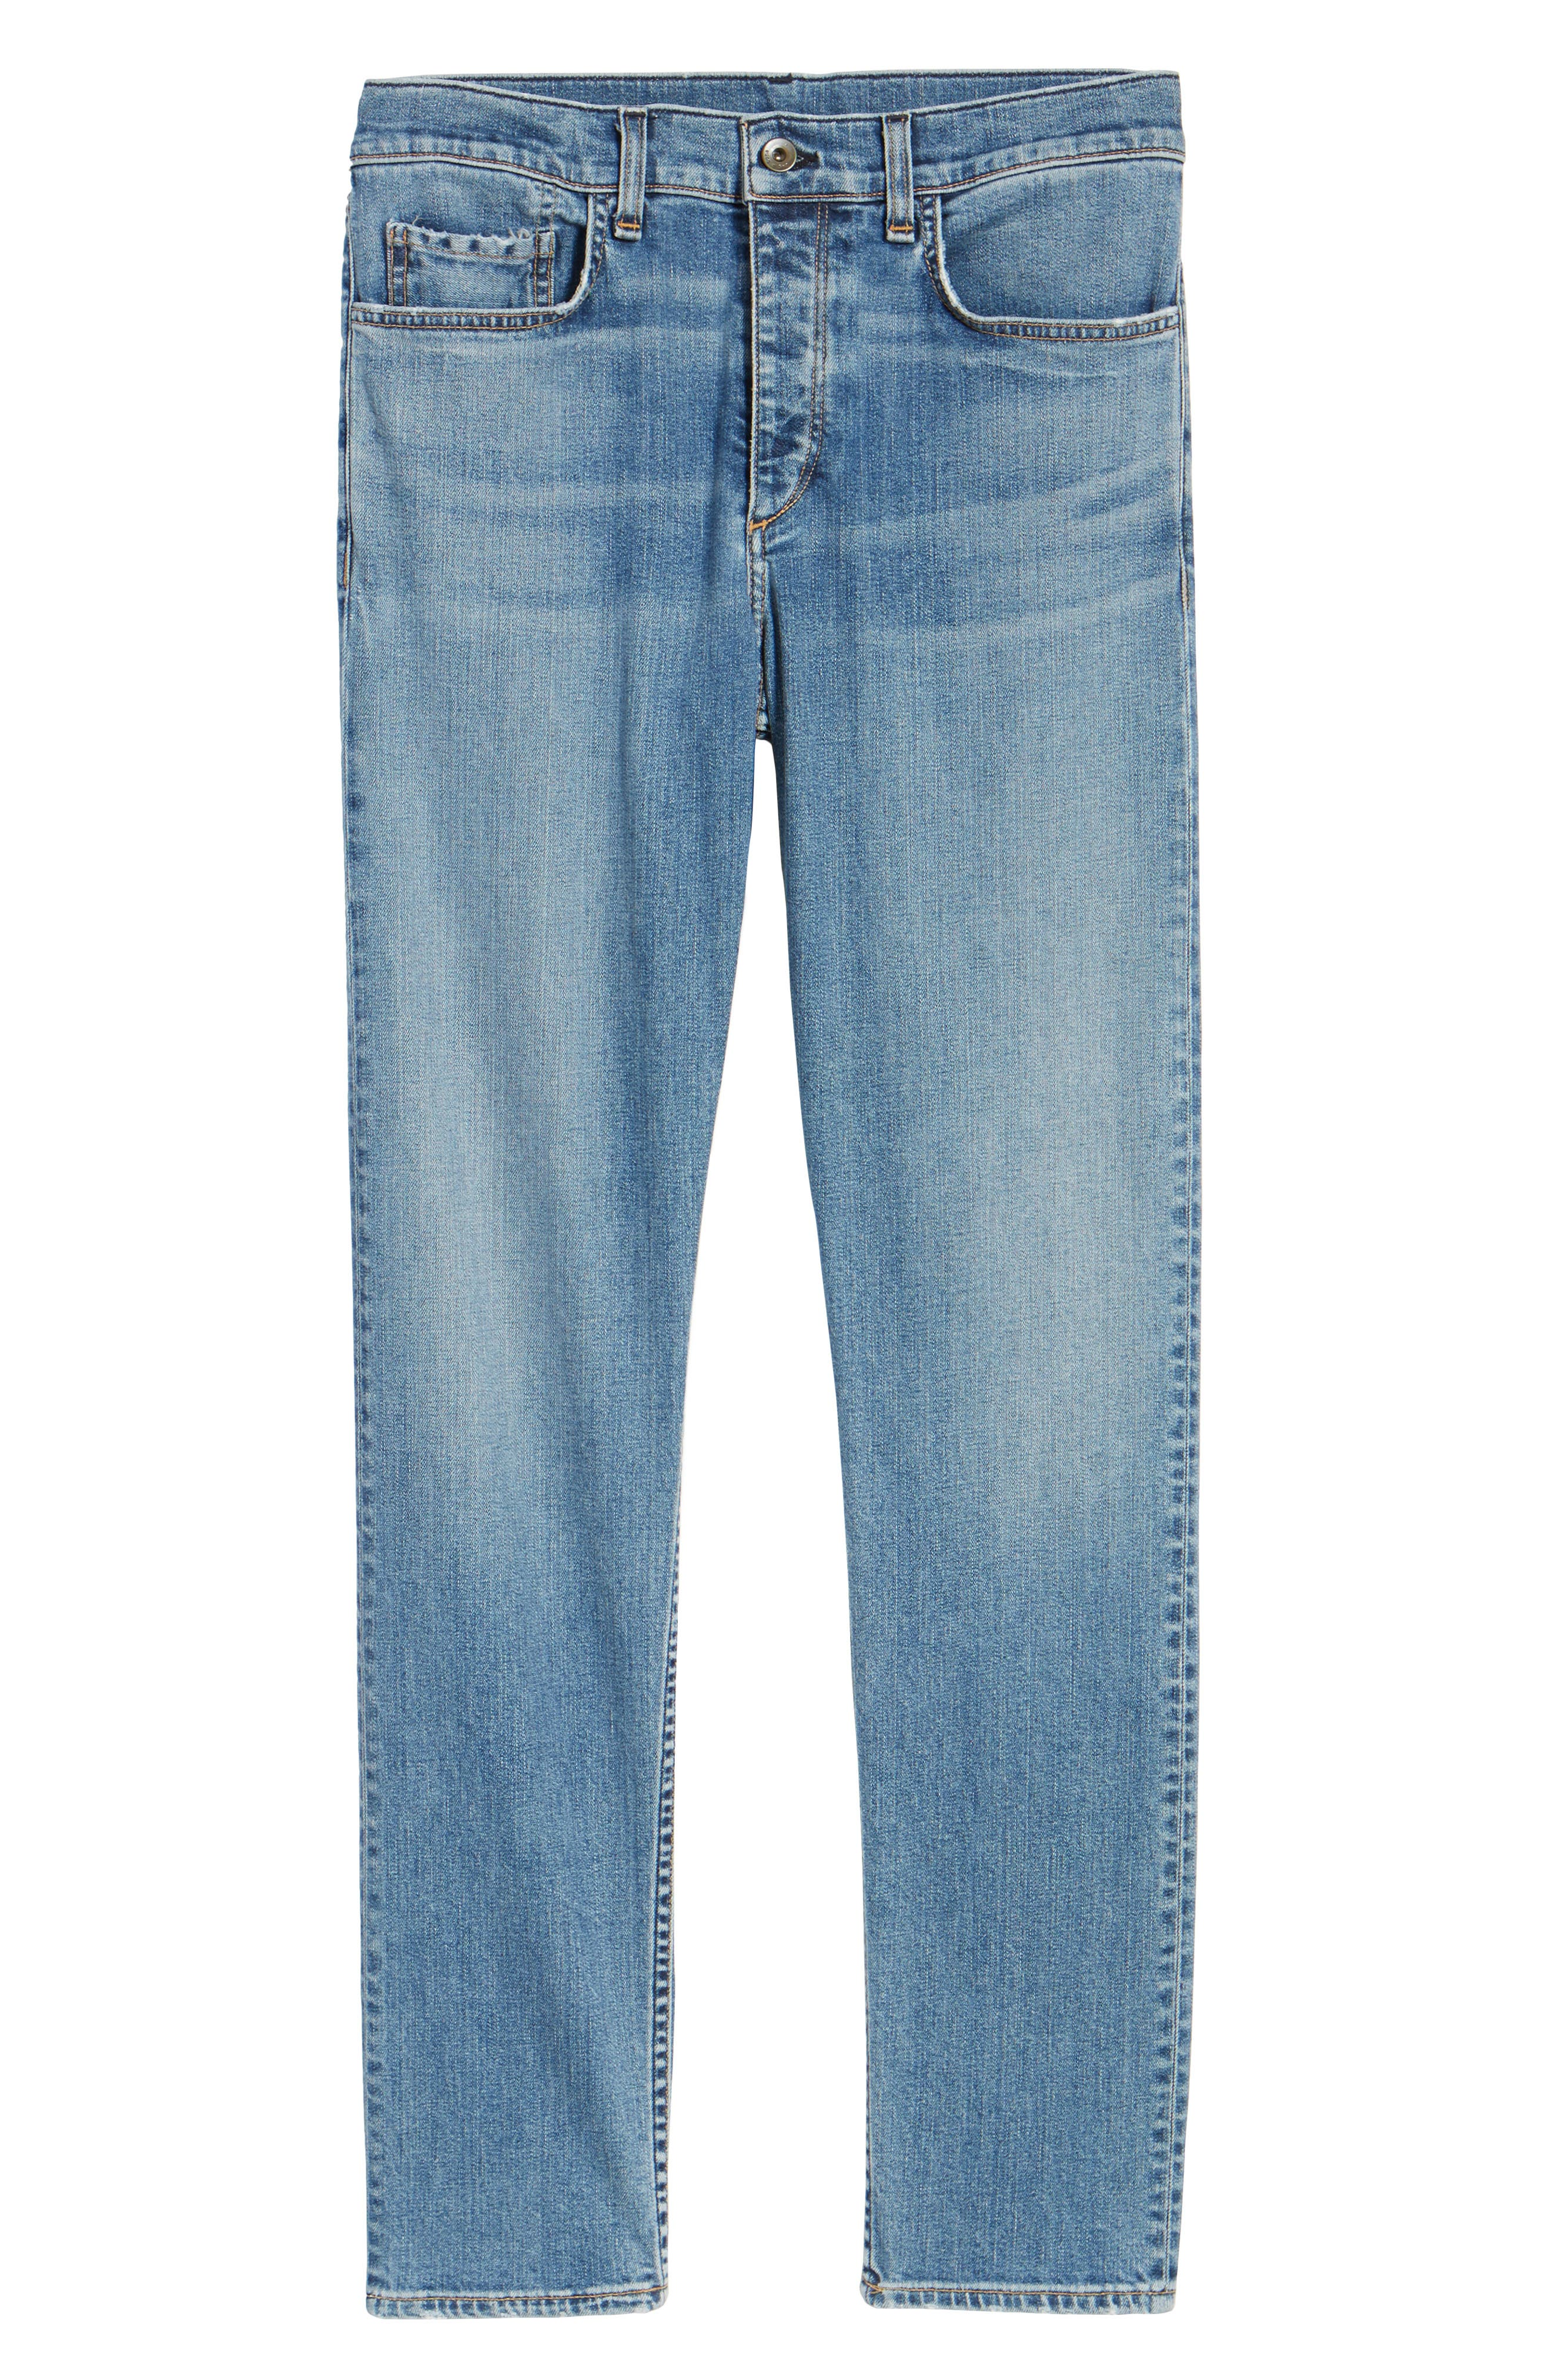 Fit 2 Slim Fit Jeans,                             Alternate thumbnail 6, color,                             DARK KINGSTON